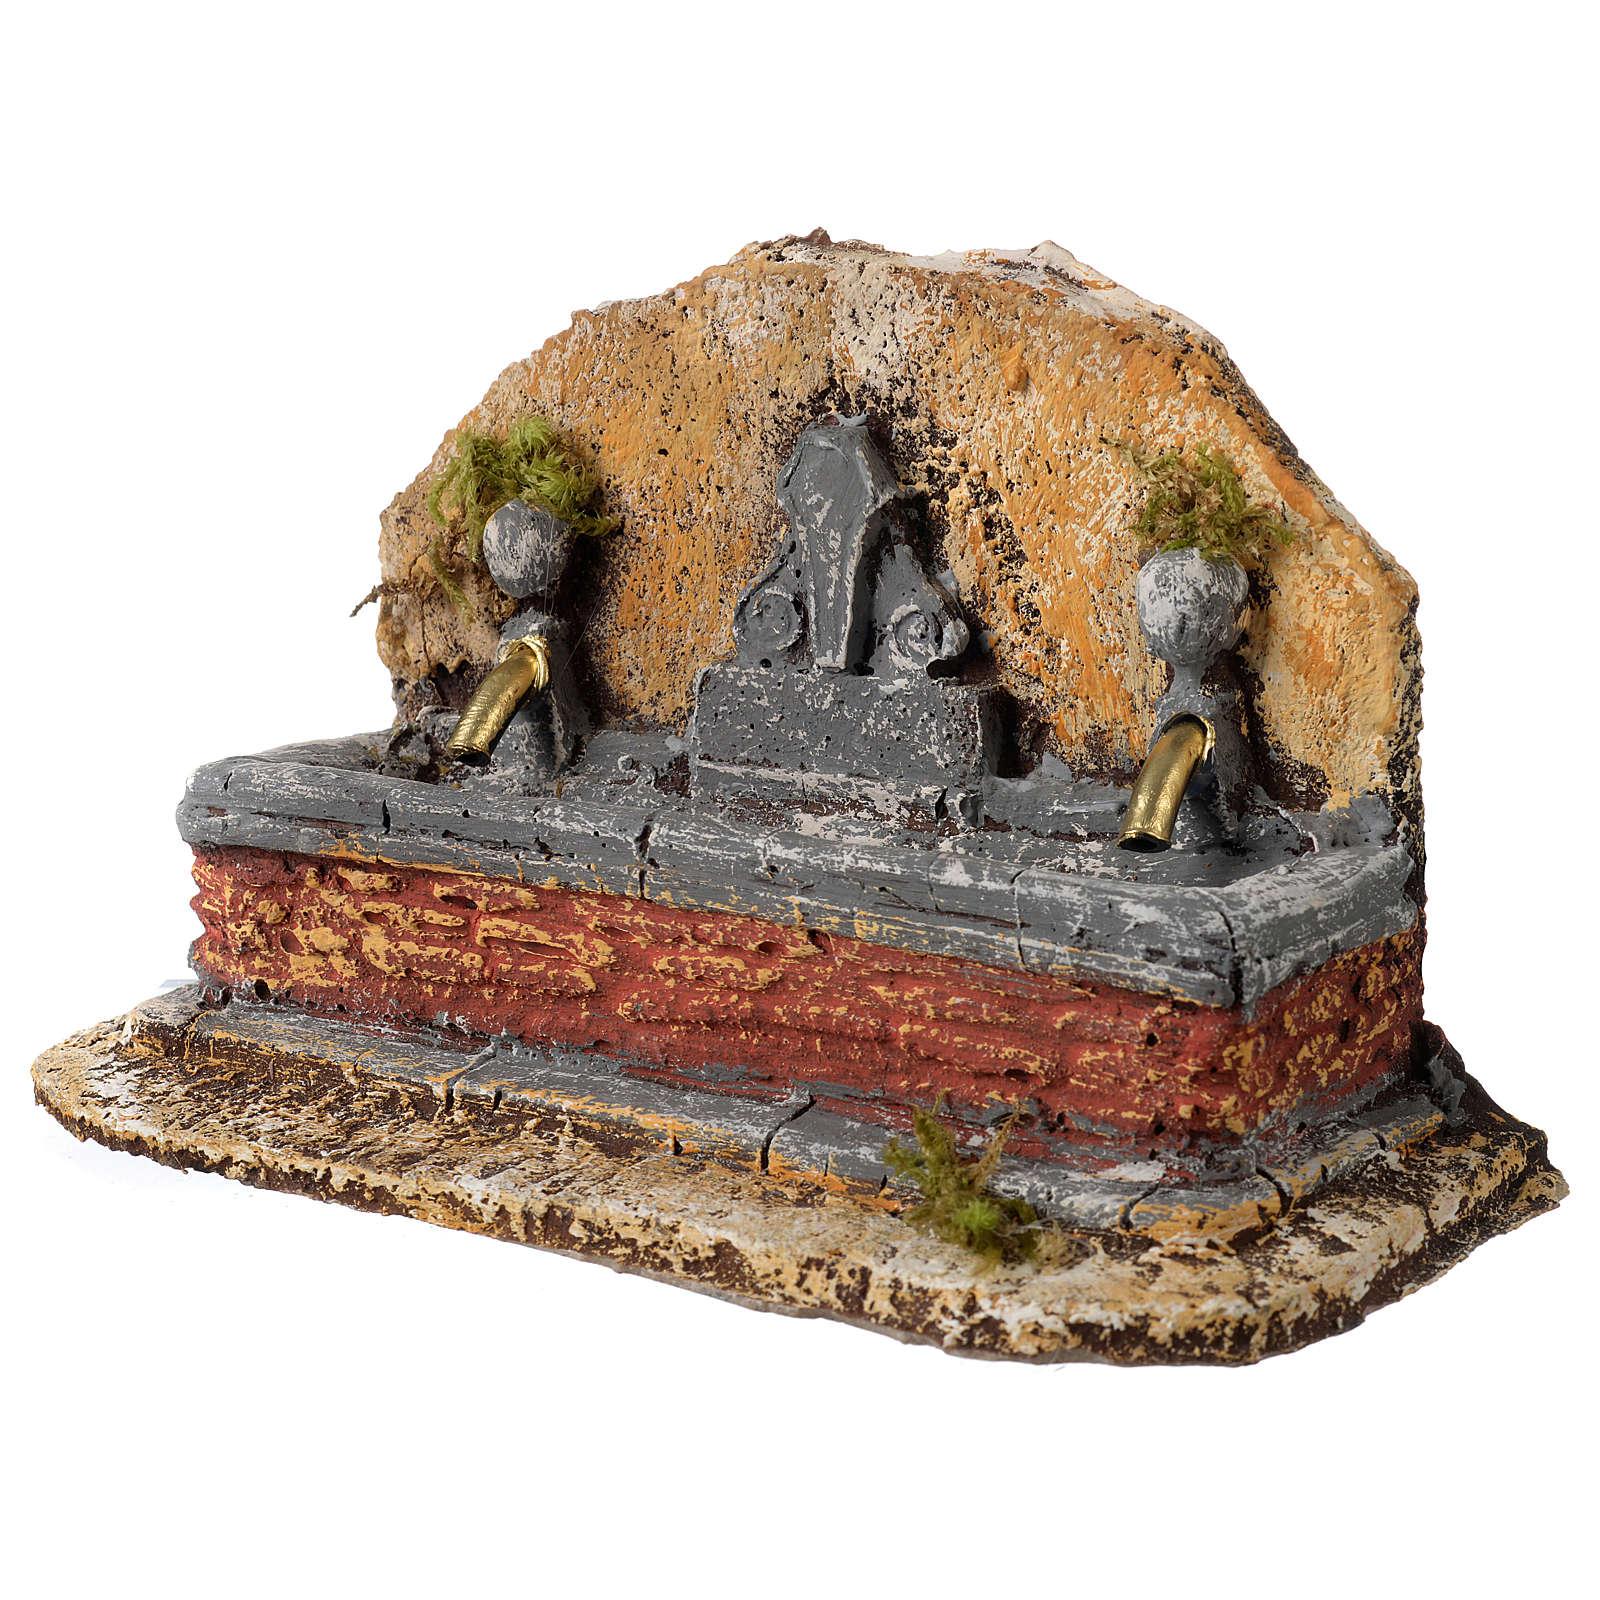 Fontana resina due getti presepe 13x21x14 cm 4